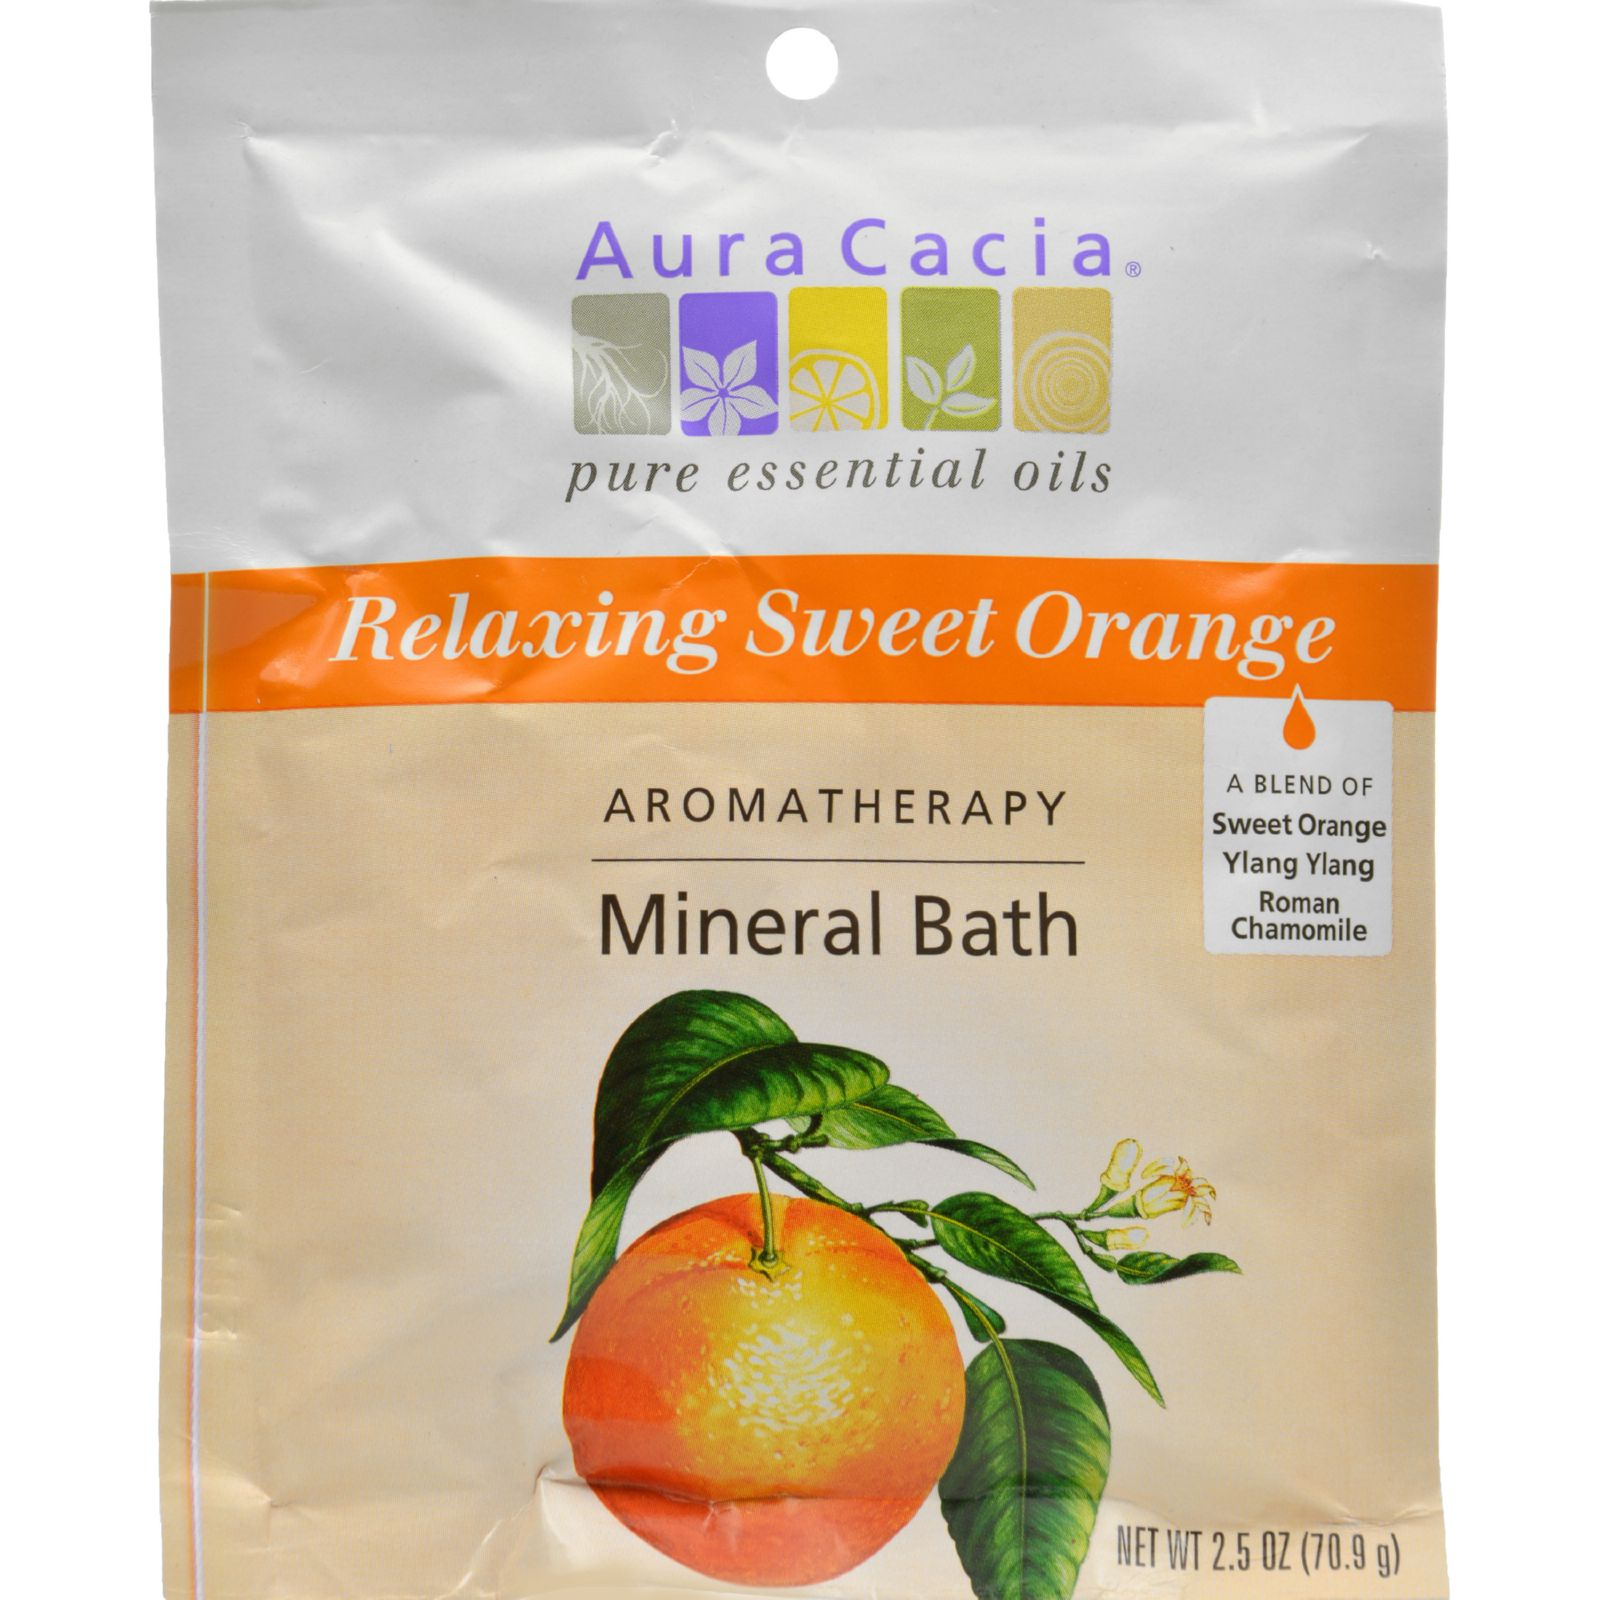 Aura Cacia Aromatherapy Mineral Bath Relaxing Sweet Orange - 2.5 oz - Case of 6